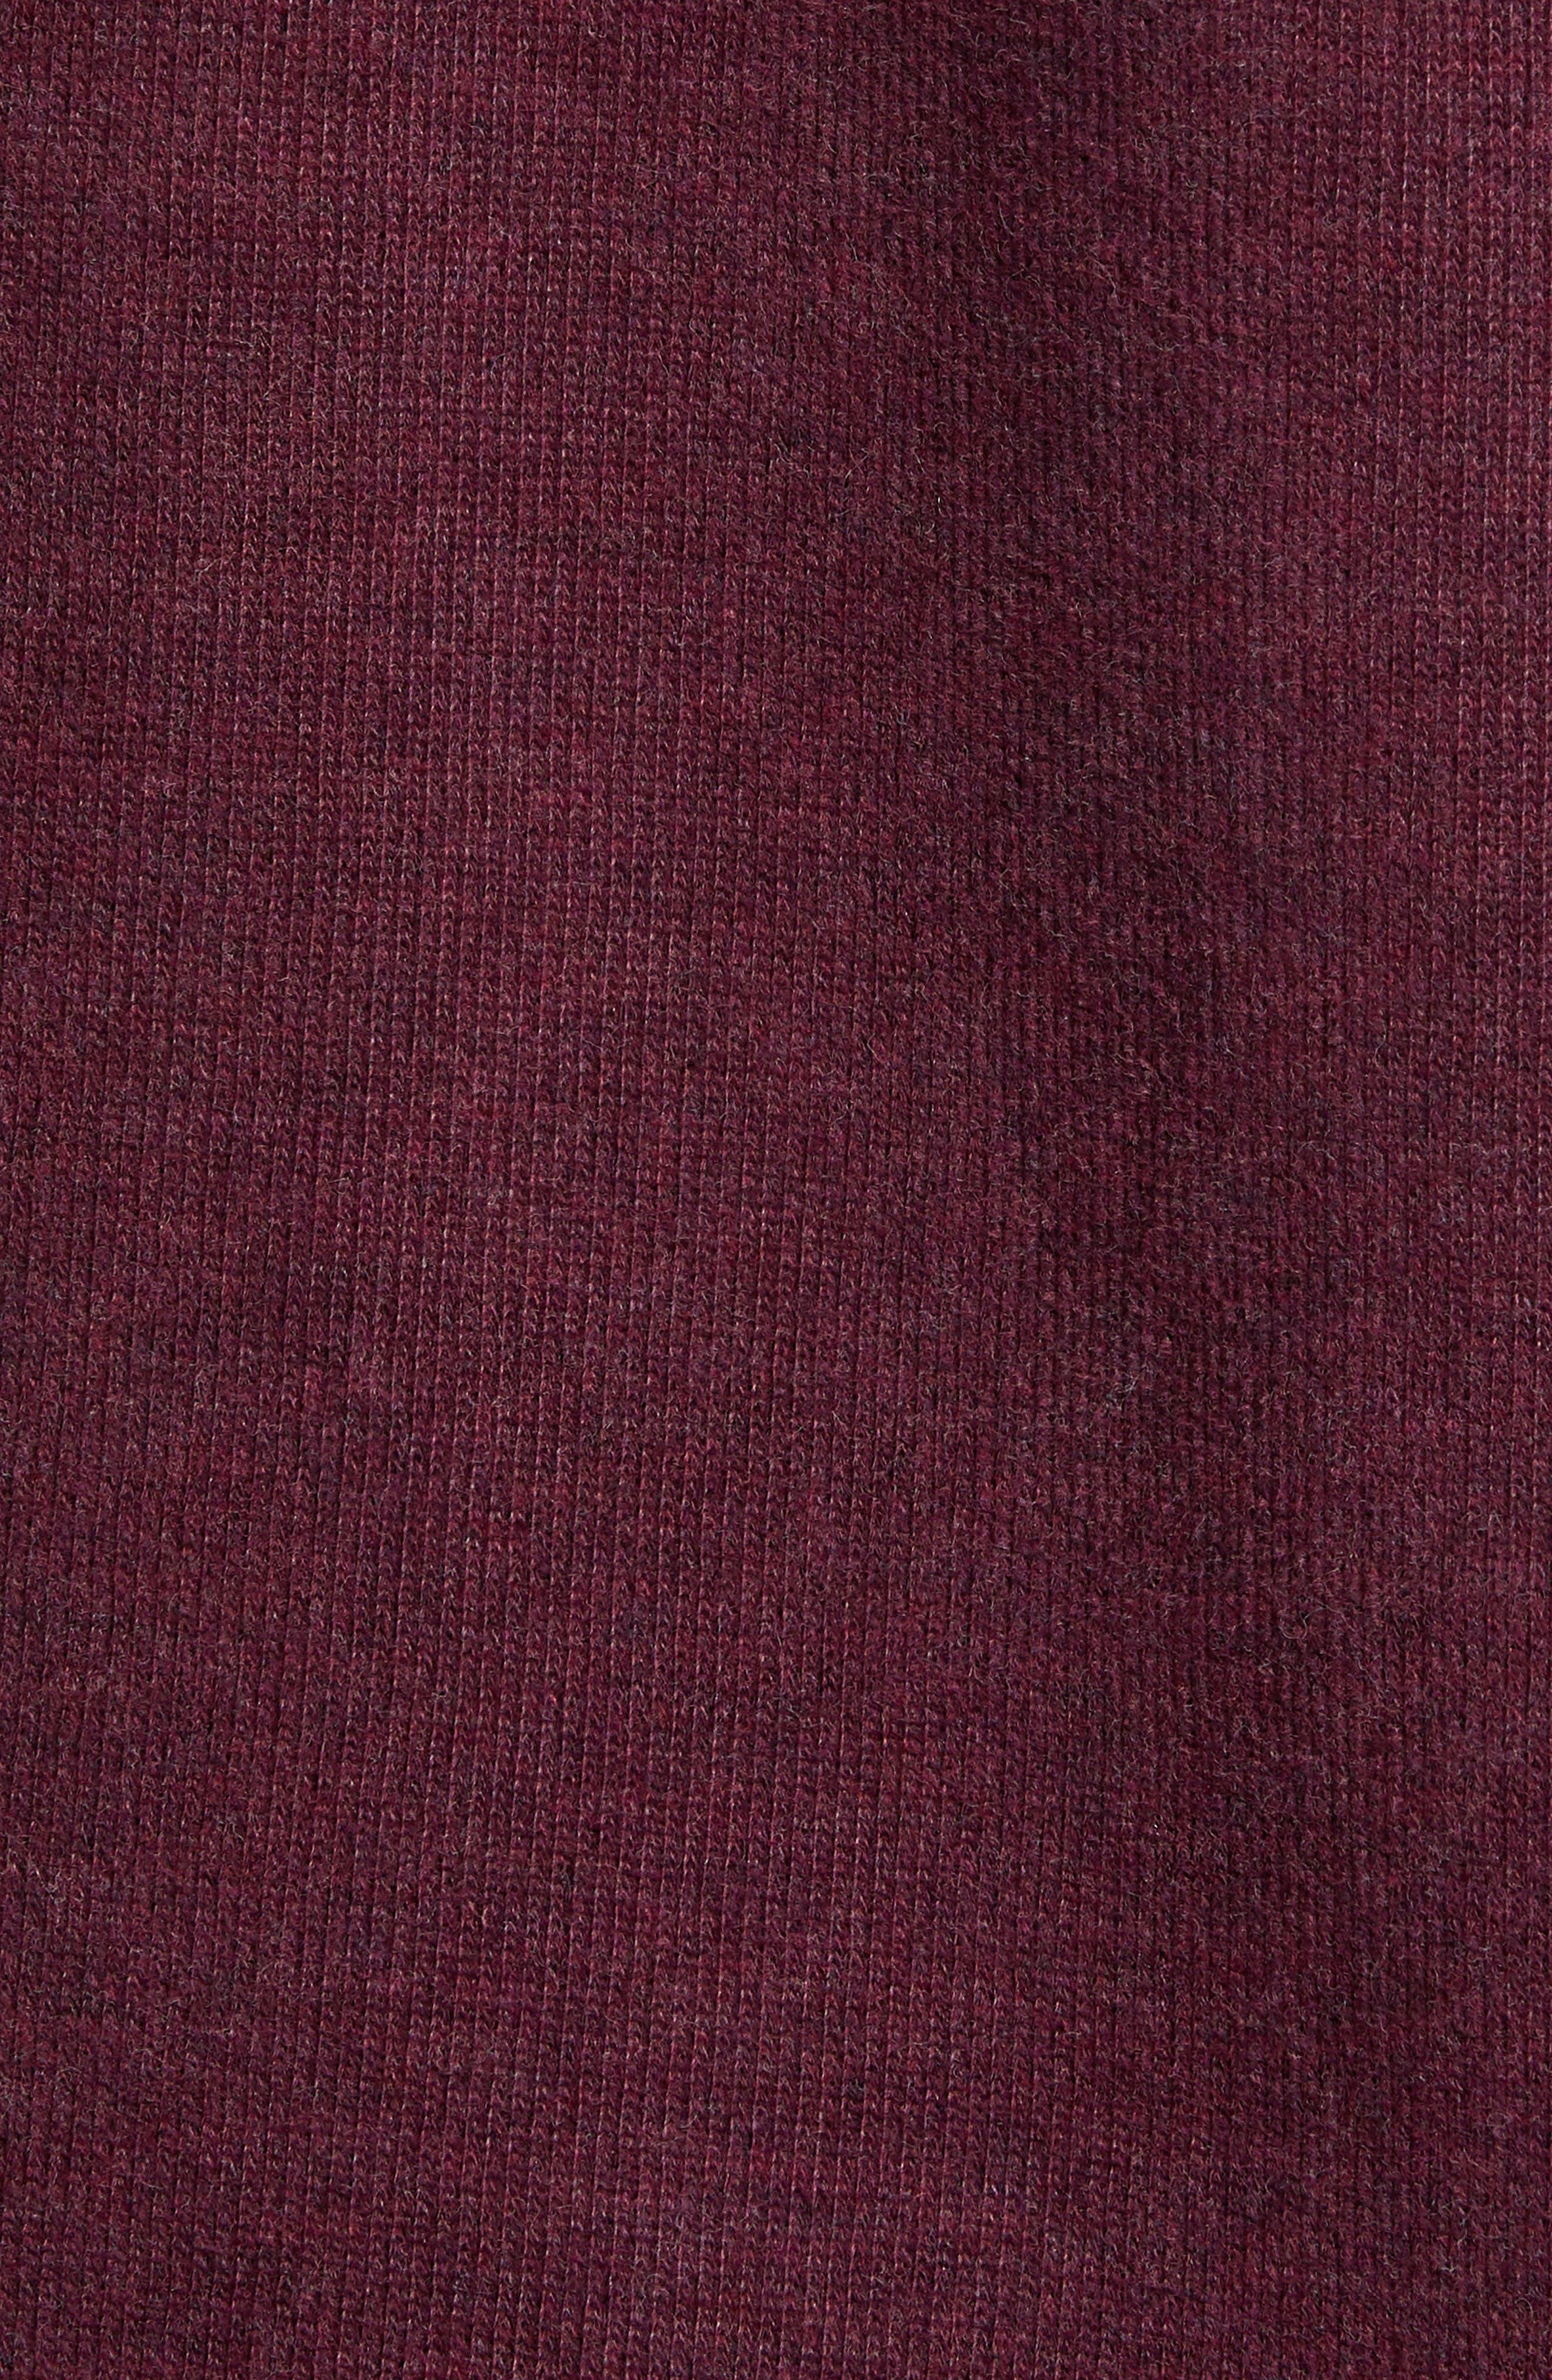 RODD & GUNN, Alton Ave Regular Fit Pullover Sweatshirt, Alternate thumbnail 5, color, BURGUNDY